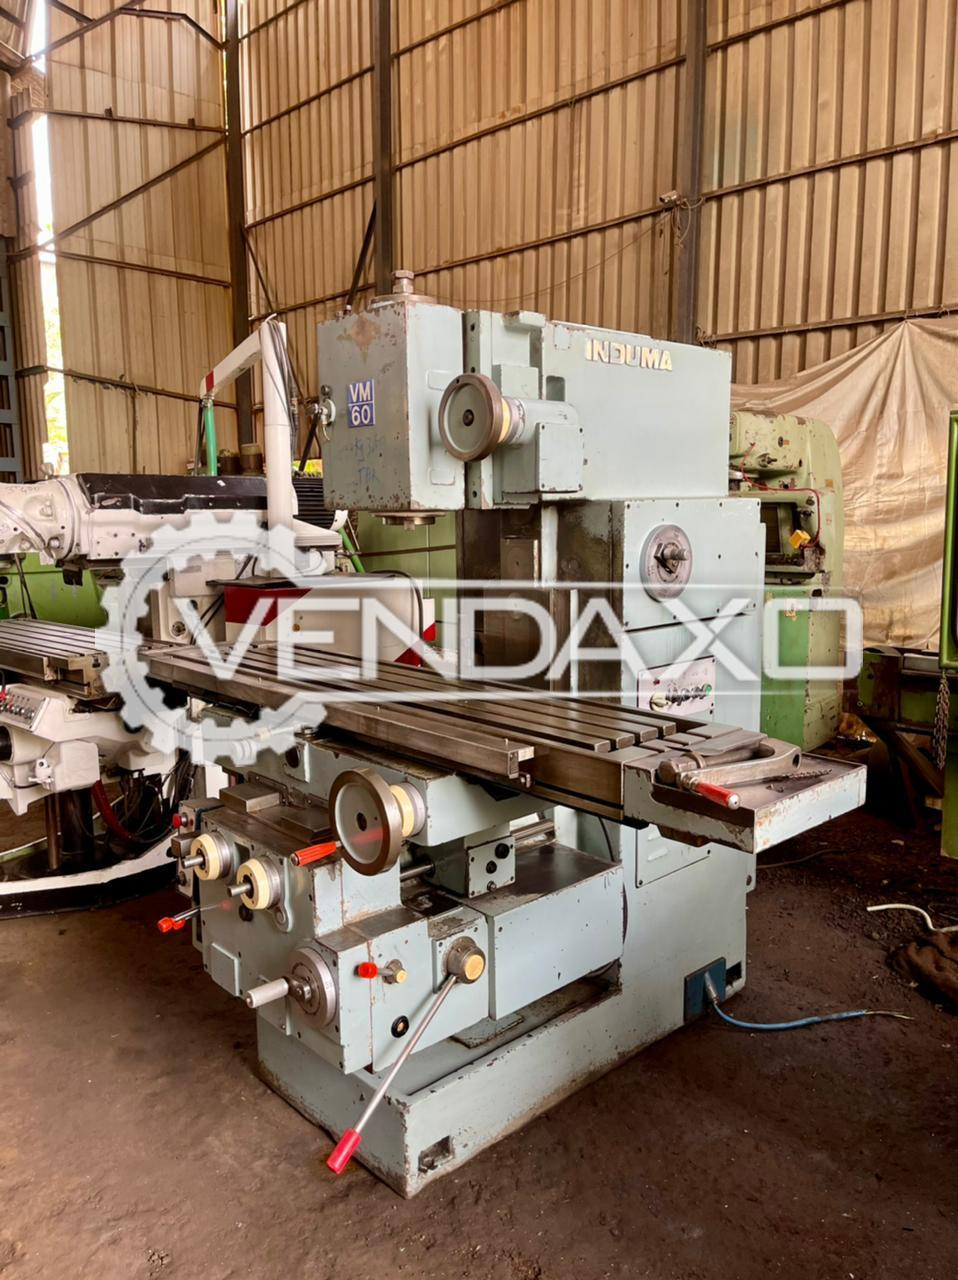 Induma Vertical Milling Machine - Table Size - 1800 x 400 mm